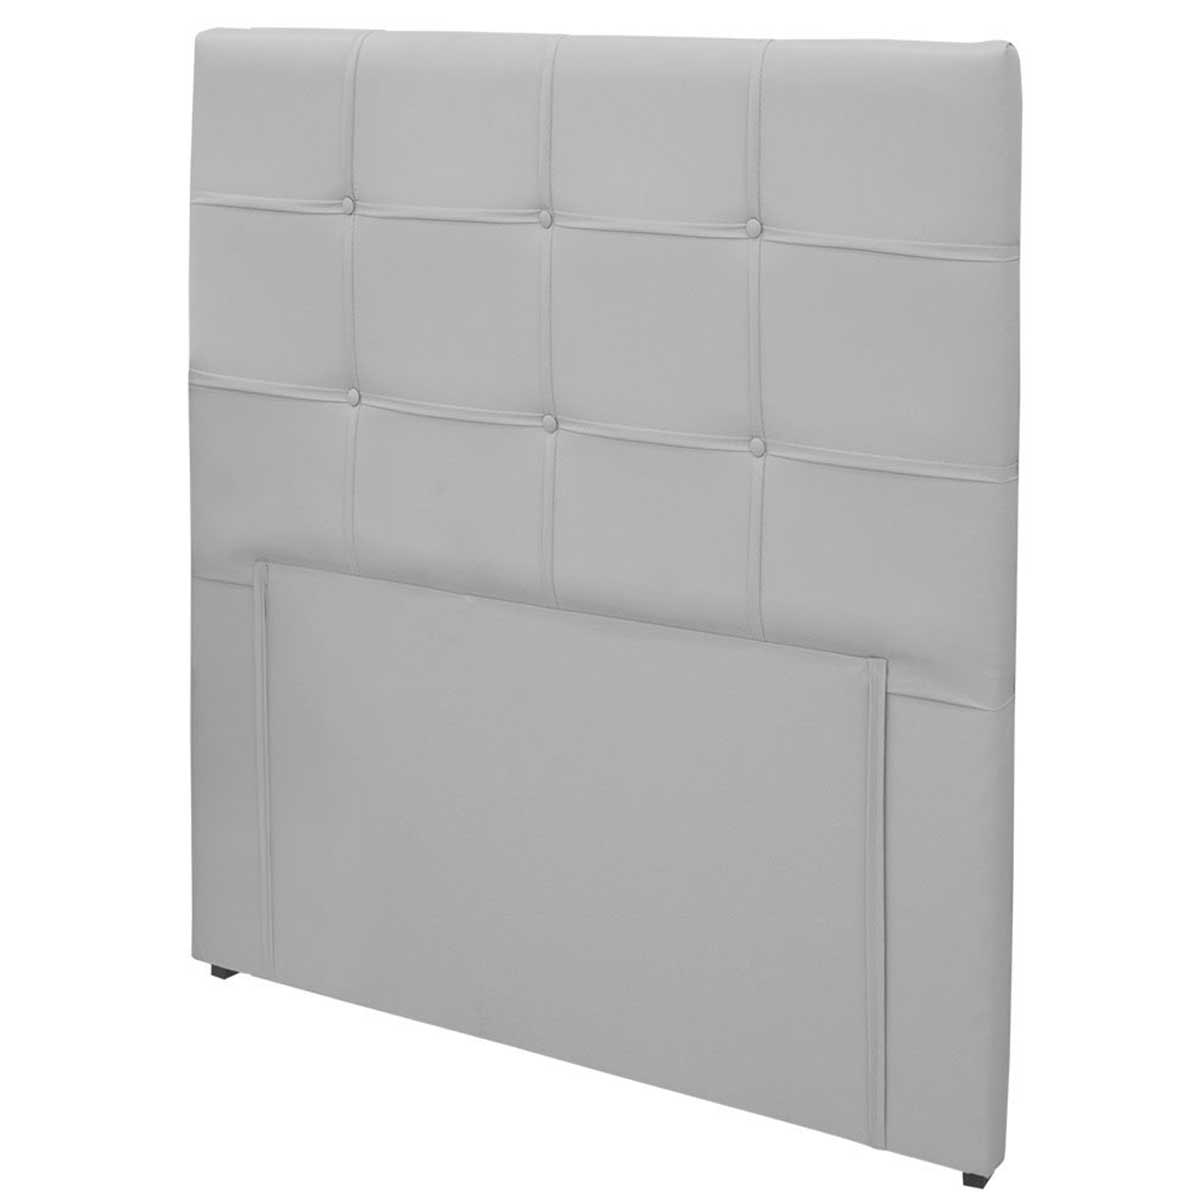 Cabeceira Casal Estofada Clean 140 cm Helanca Branco Simbal